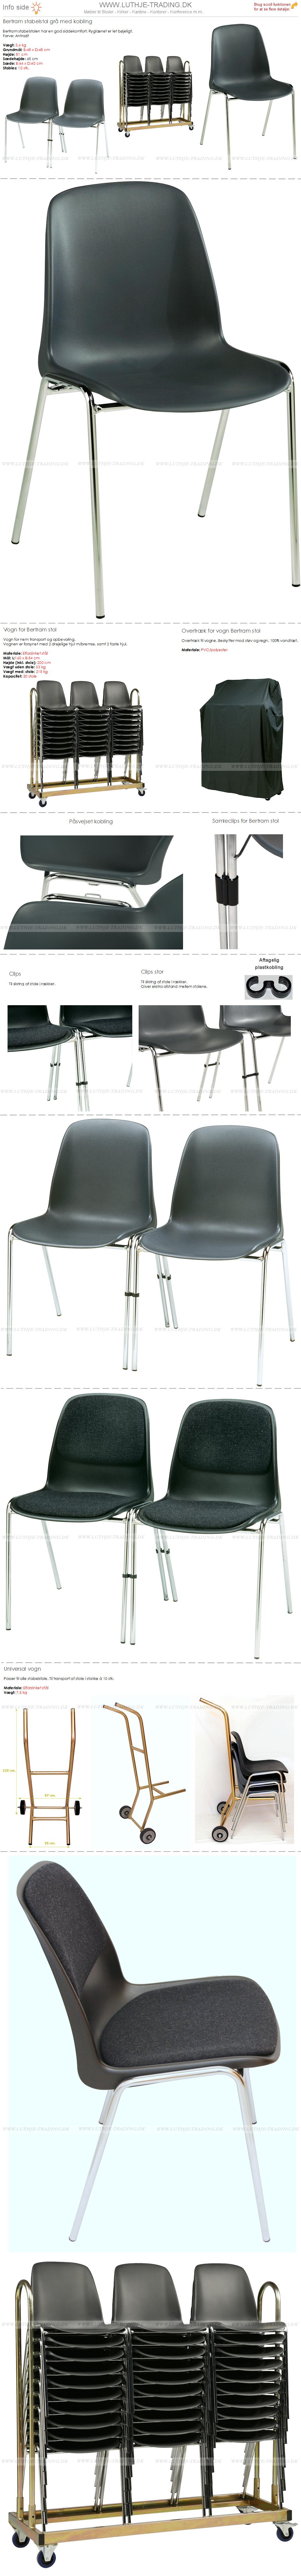 Bertram plaststole grå-kobling